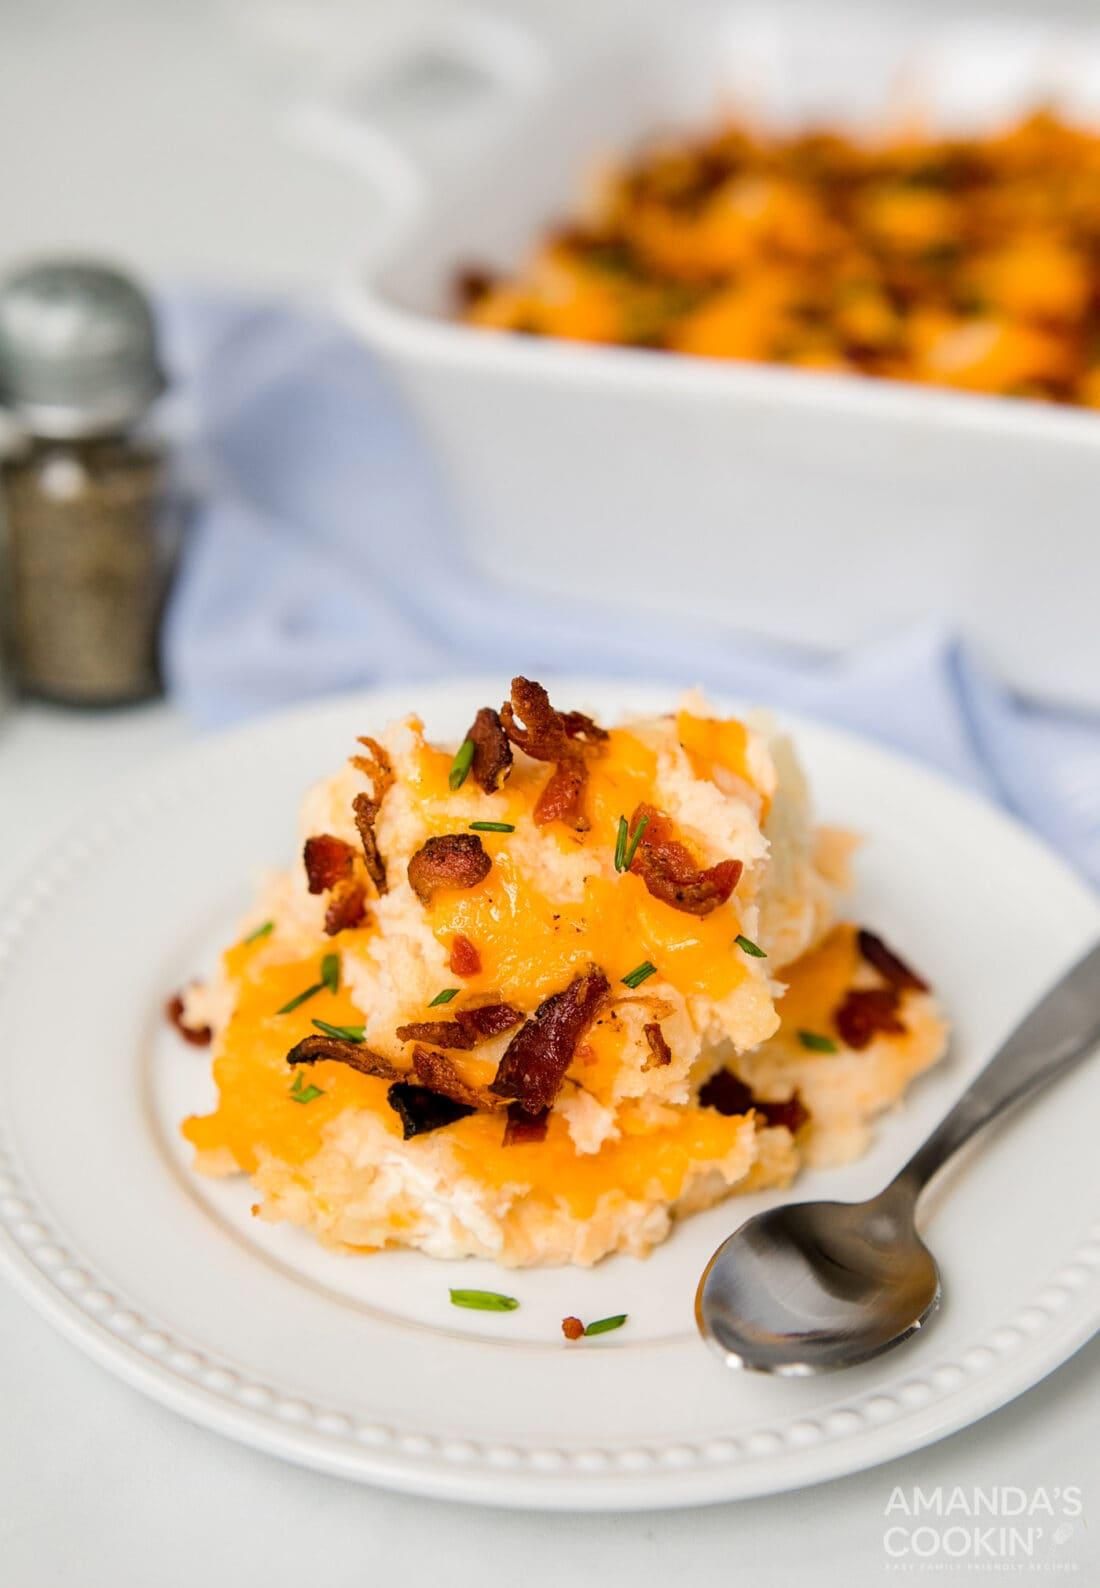 plate of potato casserole